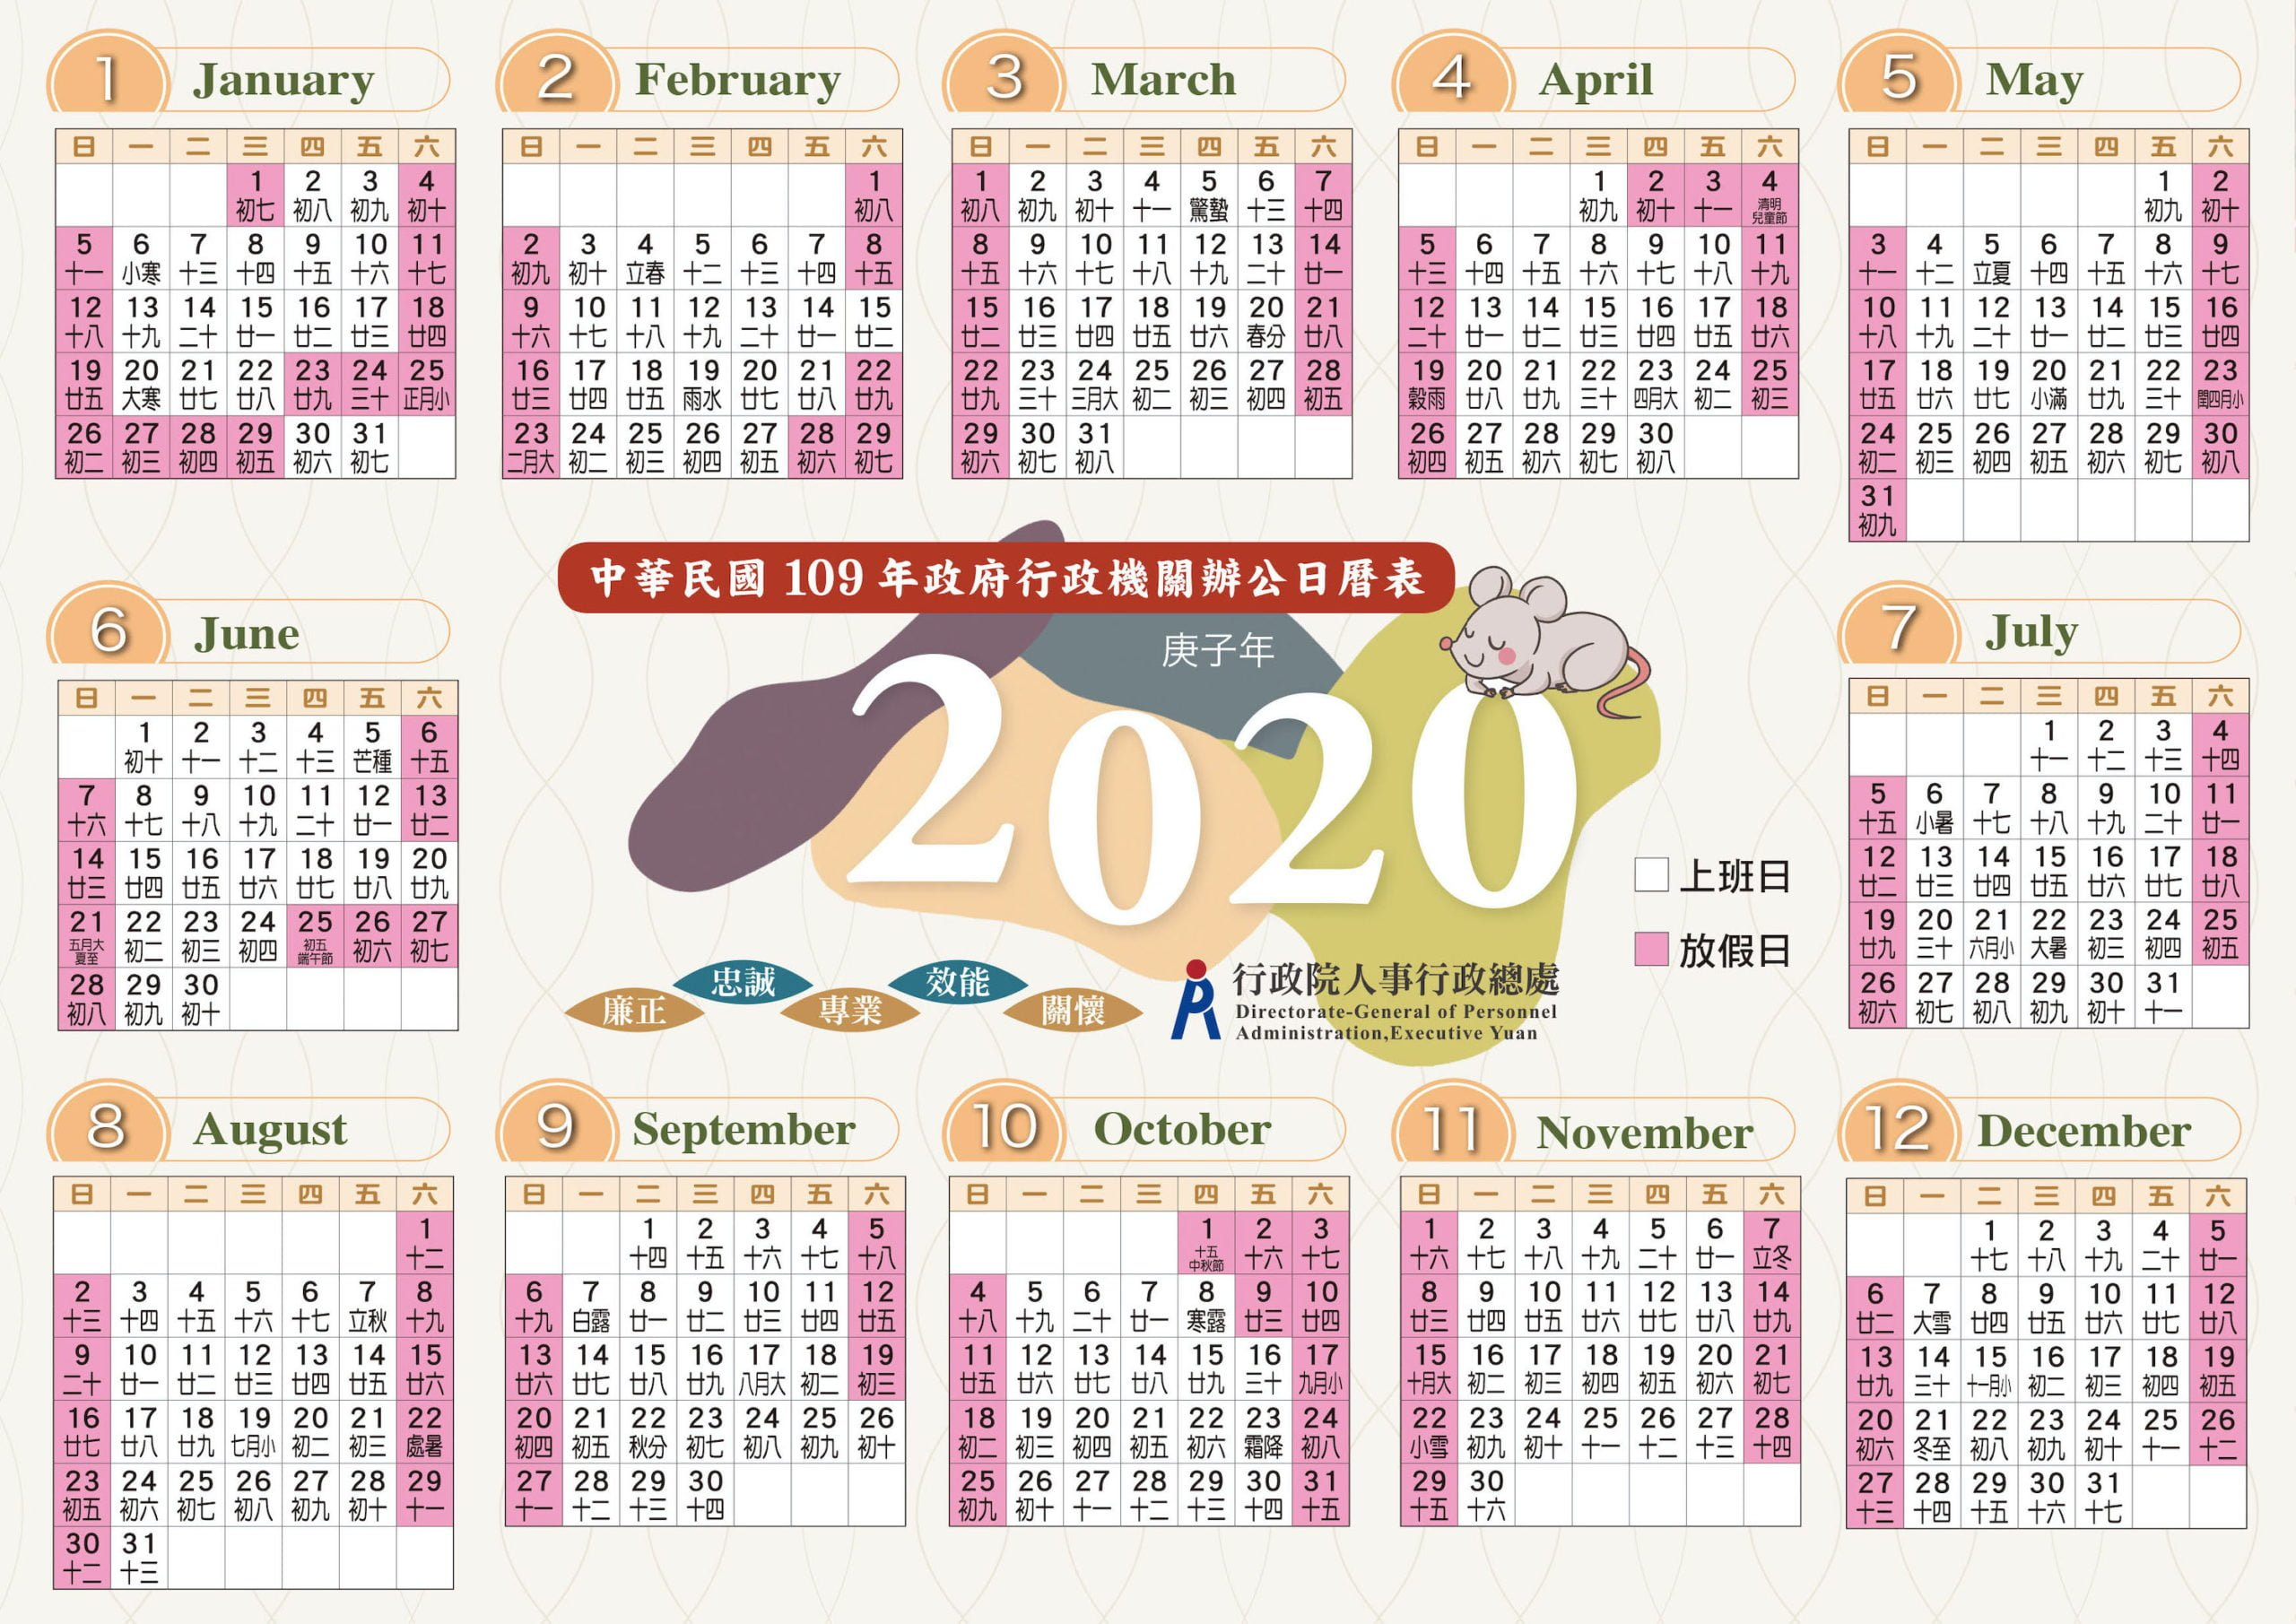 2020 Calendar Taiwan Penghu Kinmen and Matsu Republic of China 109 scaled 2020 行事曆:台灣連續假期(國定假日)109 年日程表